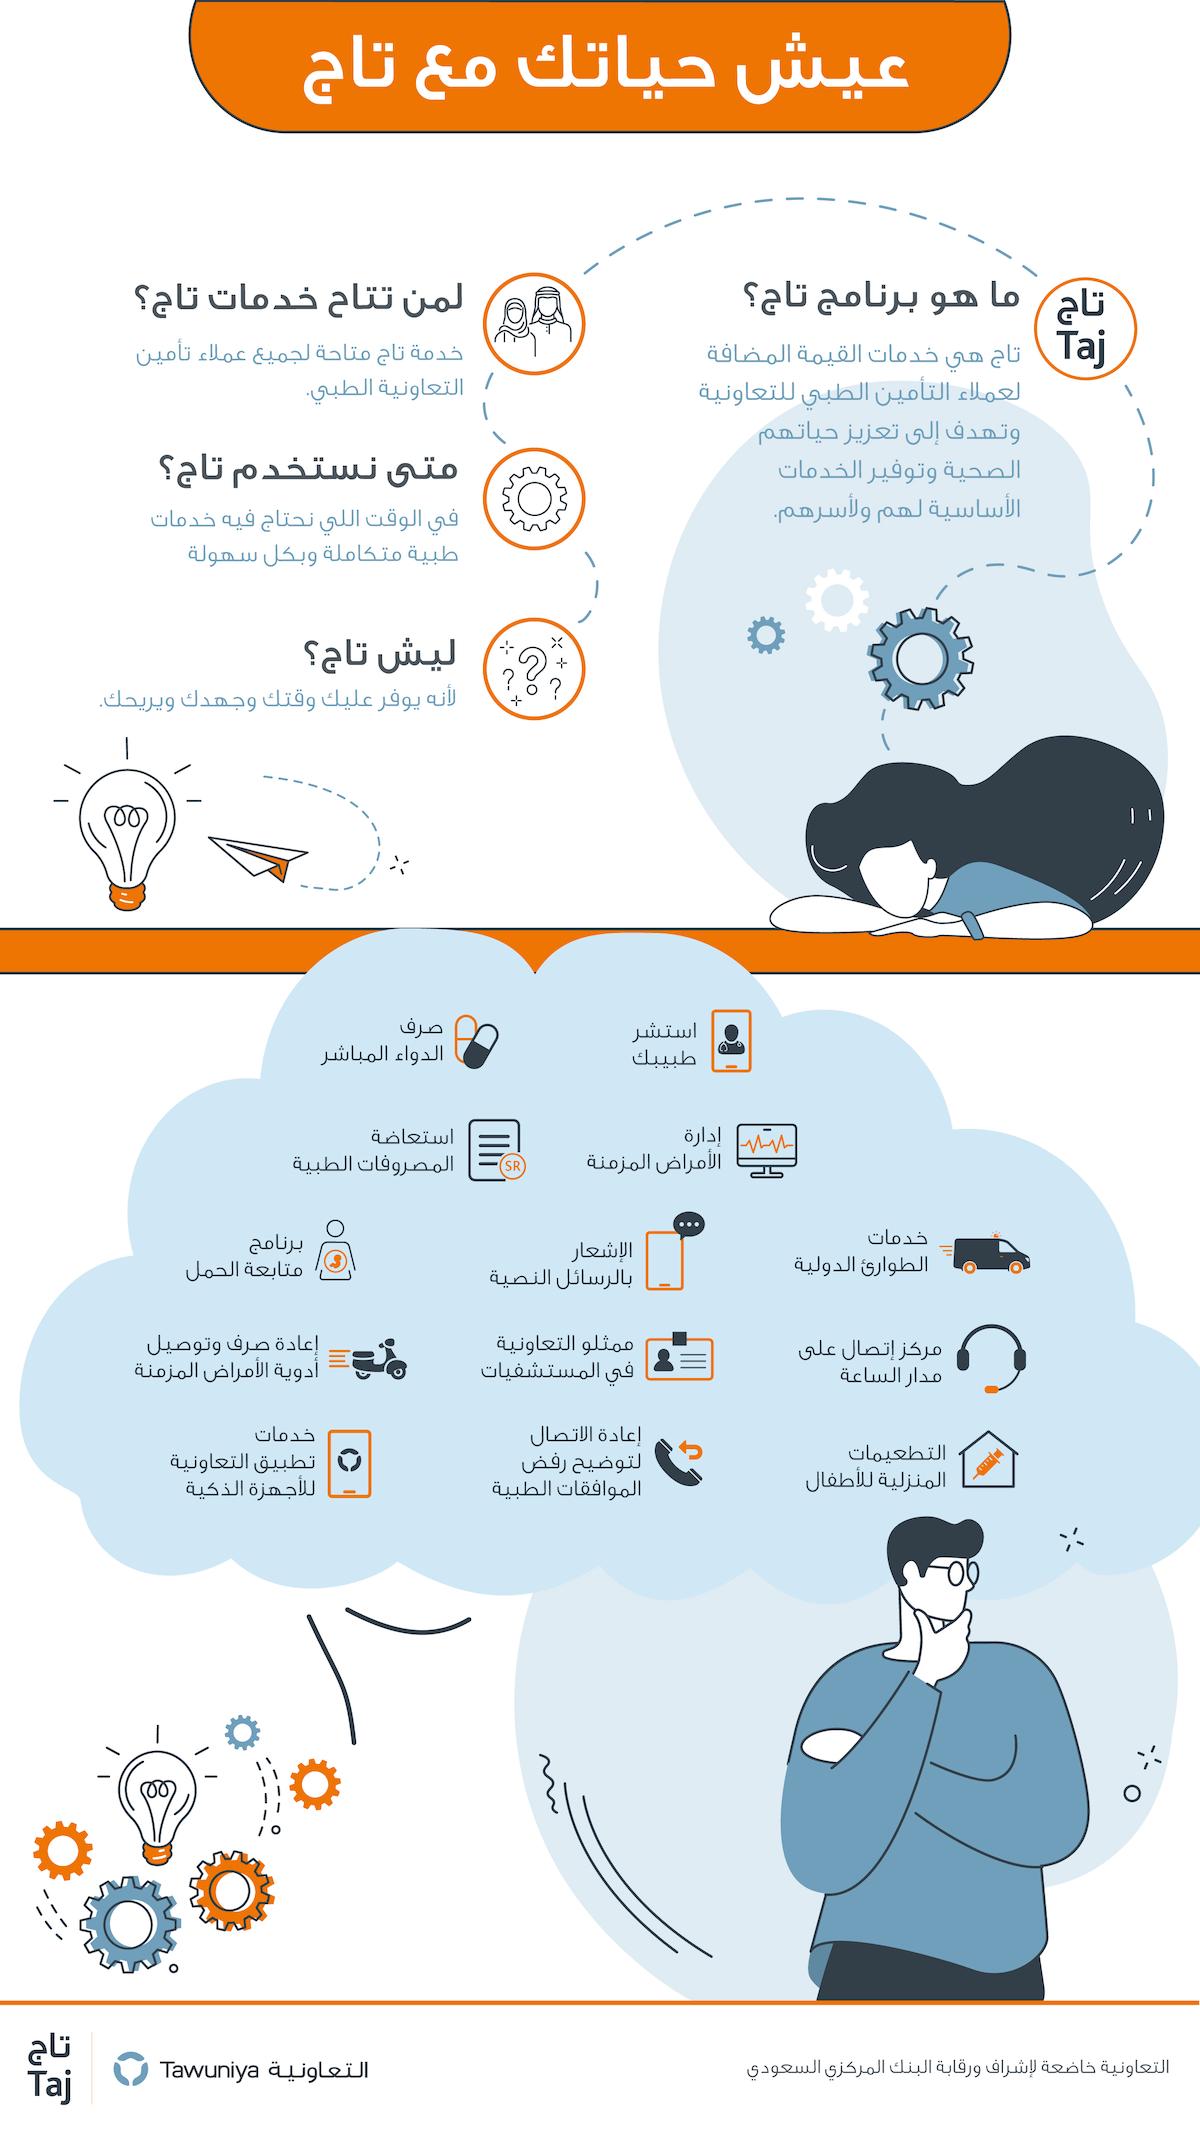 Taj-Infographic-op3